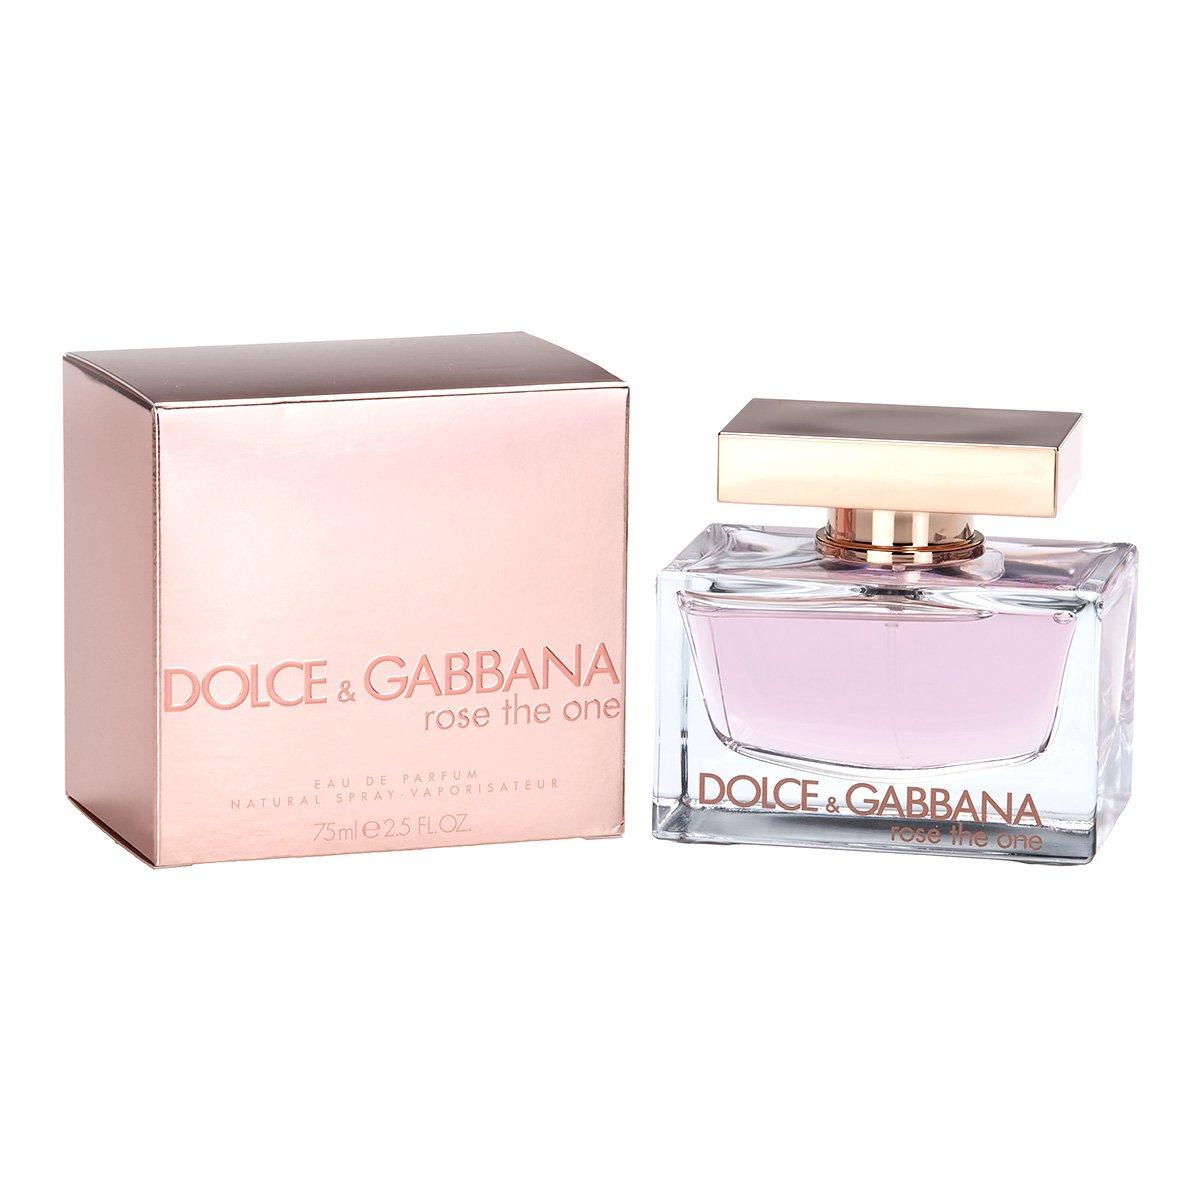 Rose Dolceamp; Dolceamp; One Gabbana The The Gabbana Rose qGMUzVSp